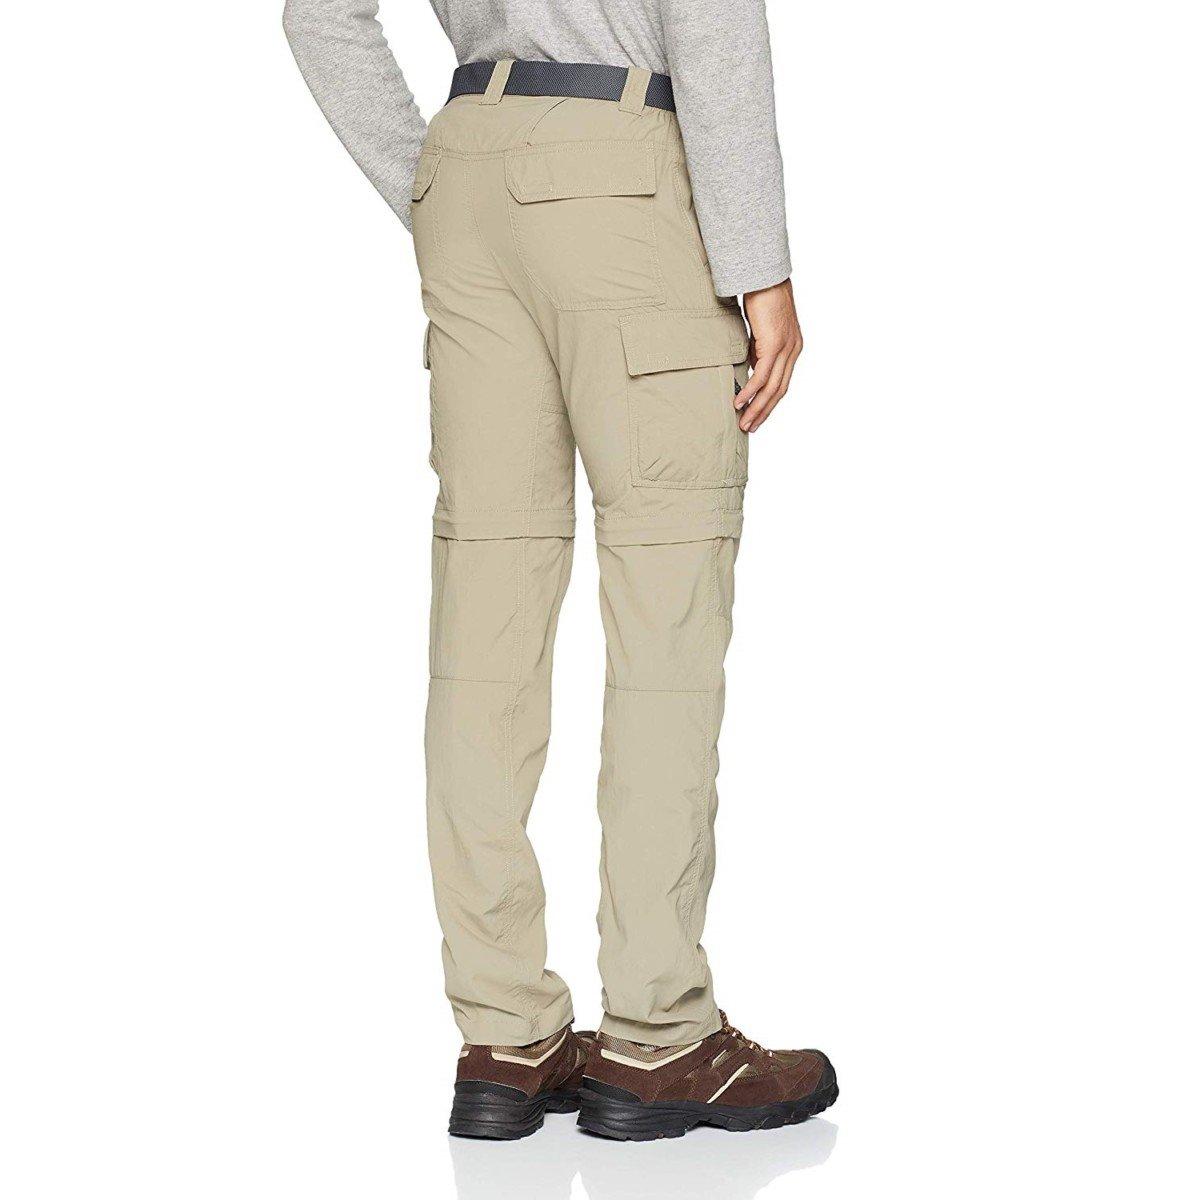 Columbia Siver Ridge II convertible pant, pantalon de randonnée convertible homme.